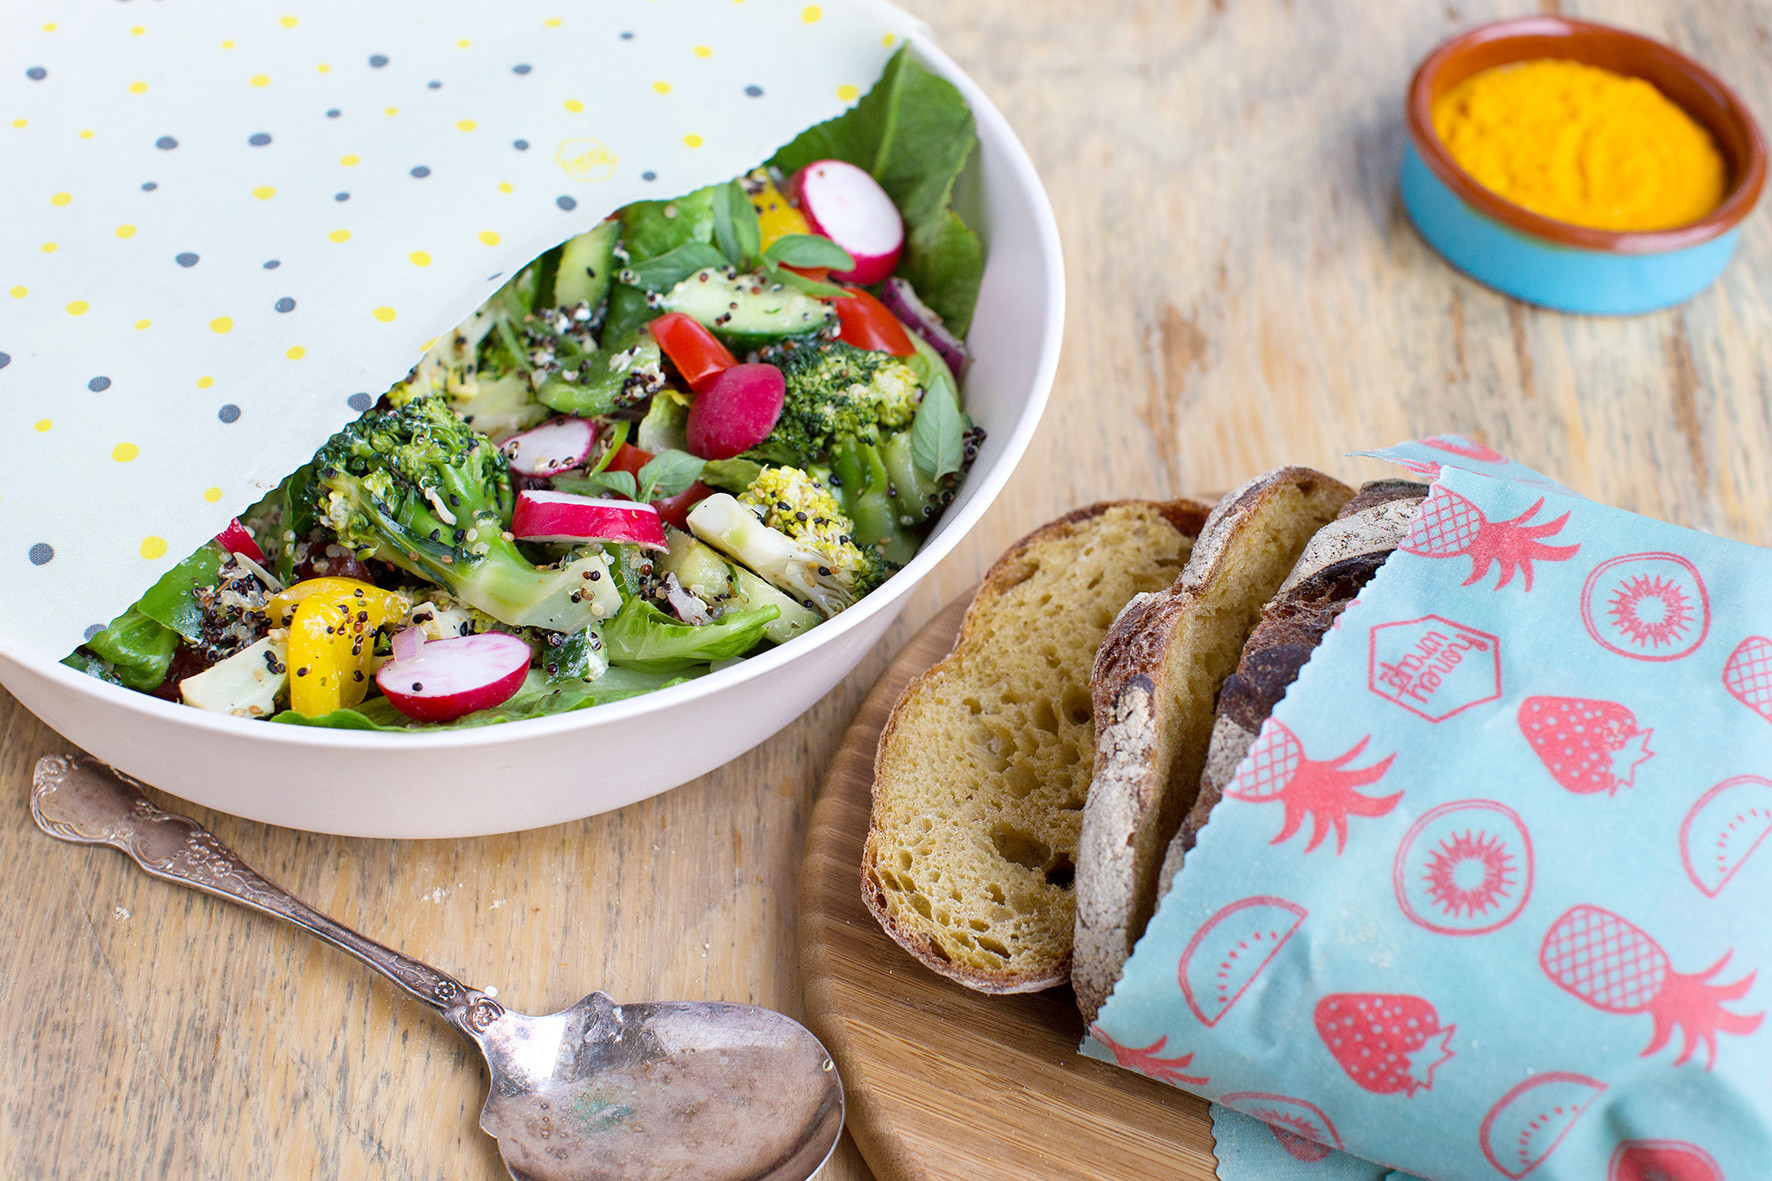 Honeywrap salad bowl